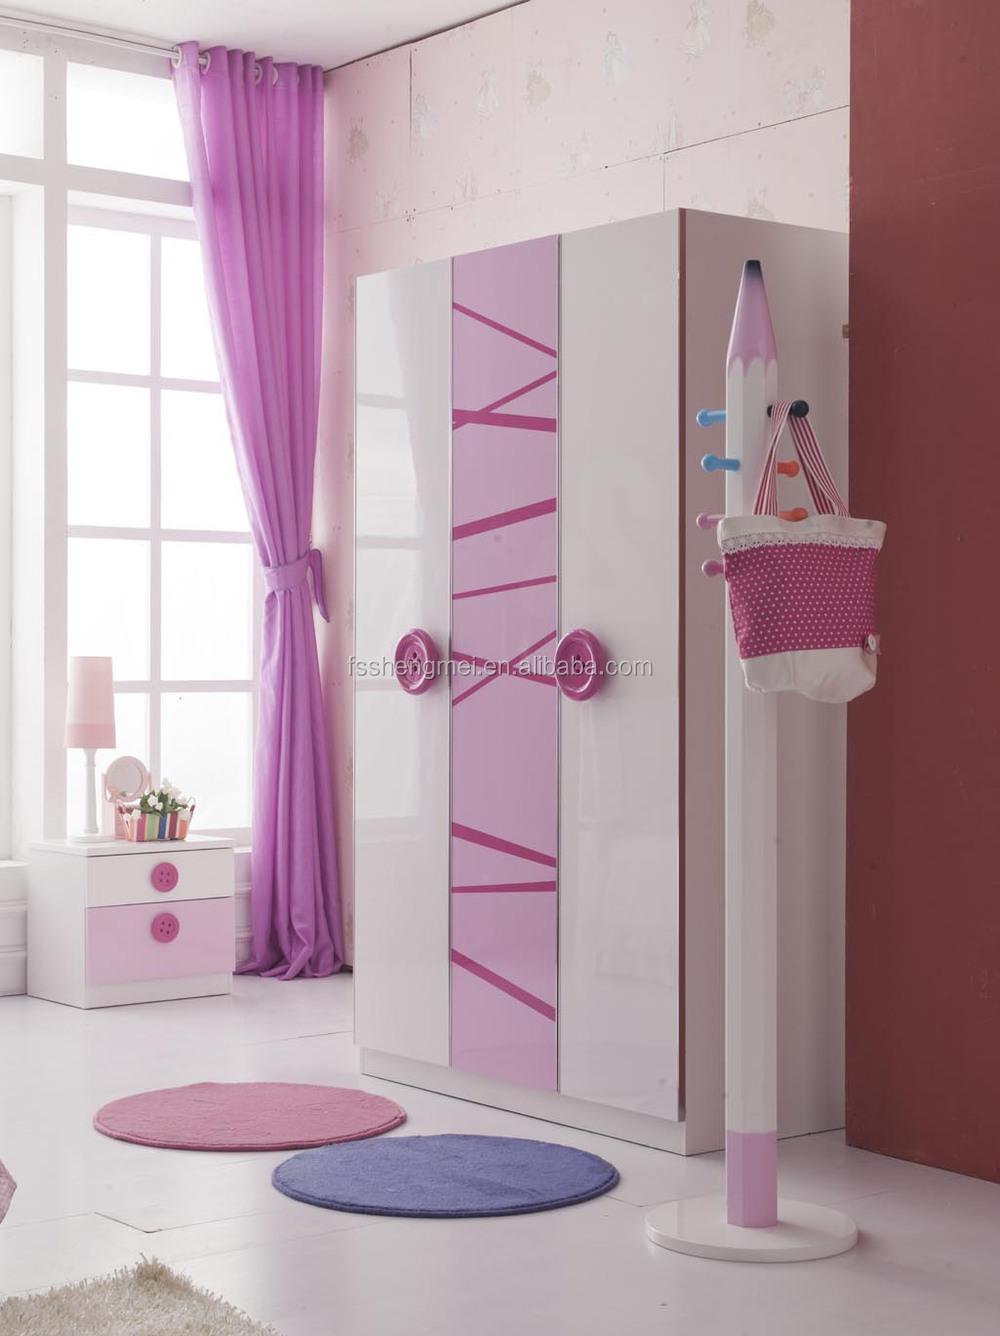 Mooie meisjes kinderen slaapkamer meubilair sets enkel bed 3 deurs ...